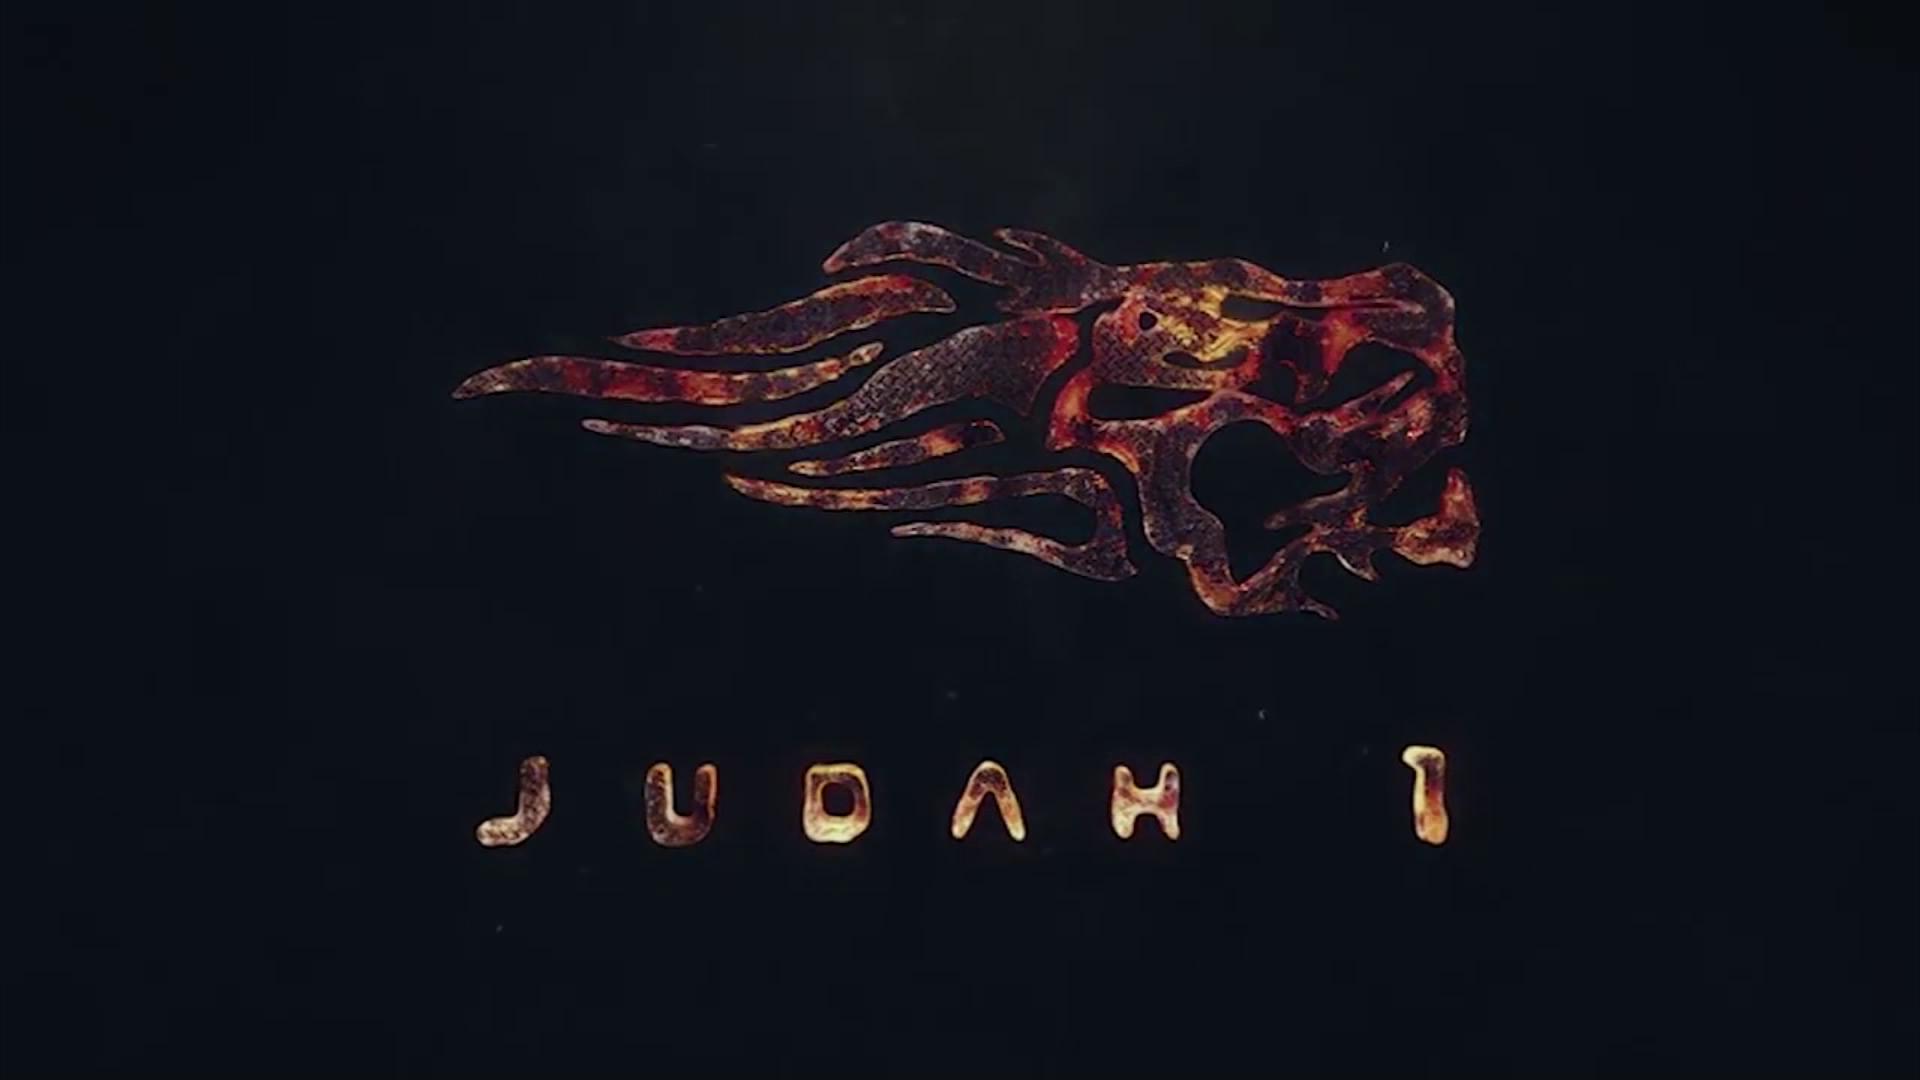 Judah 1 - The world's first Christian Airline is coming to Denison (KTEN)